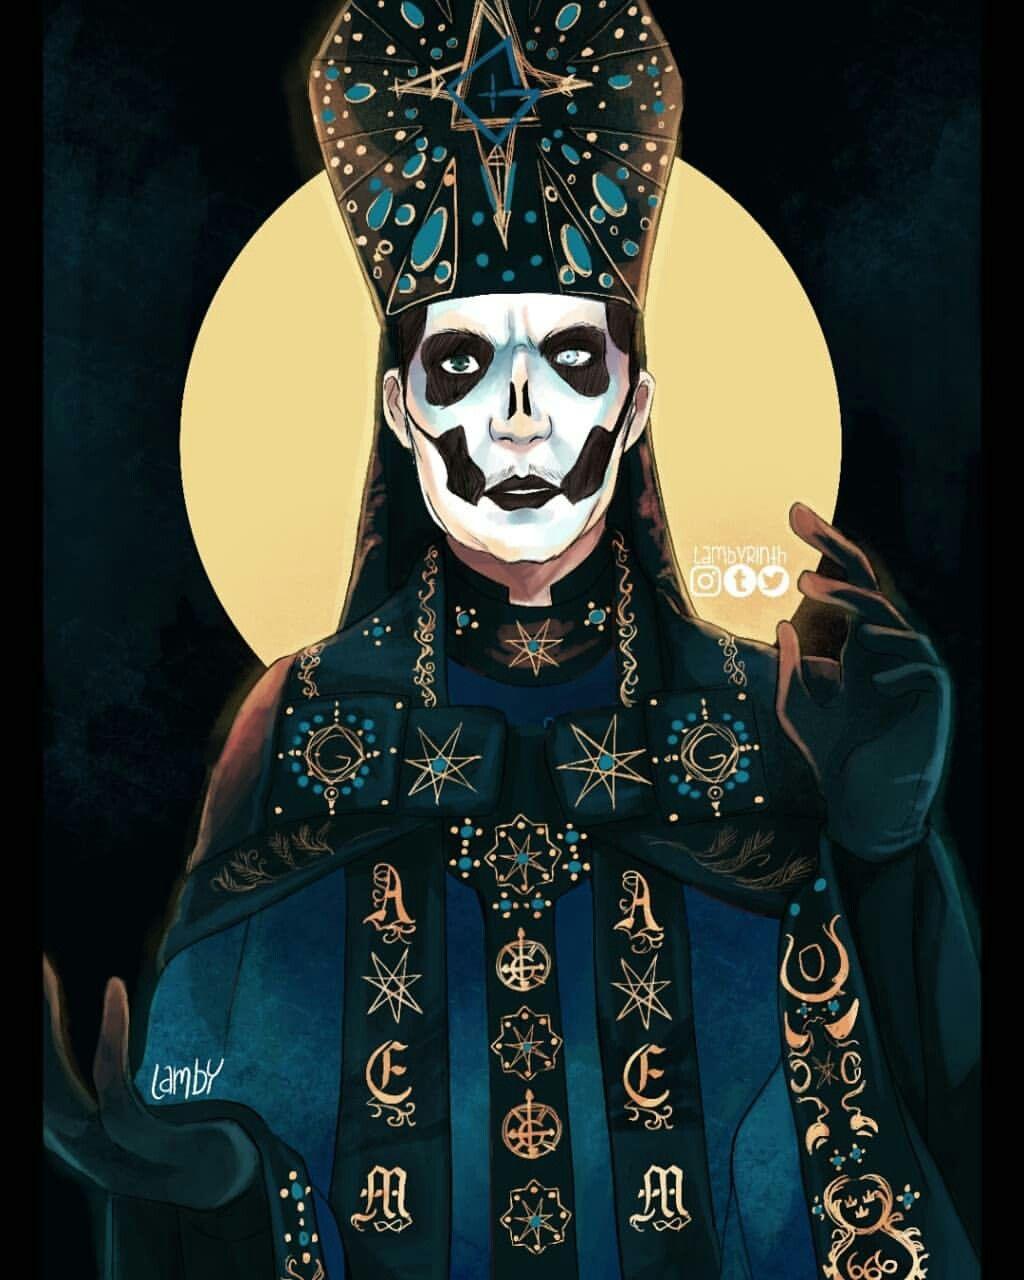 Papa Emeritus Iv By Lambyrinth Ghost Papa Ghost Papa Emeritus Ghost Bc